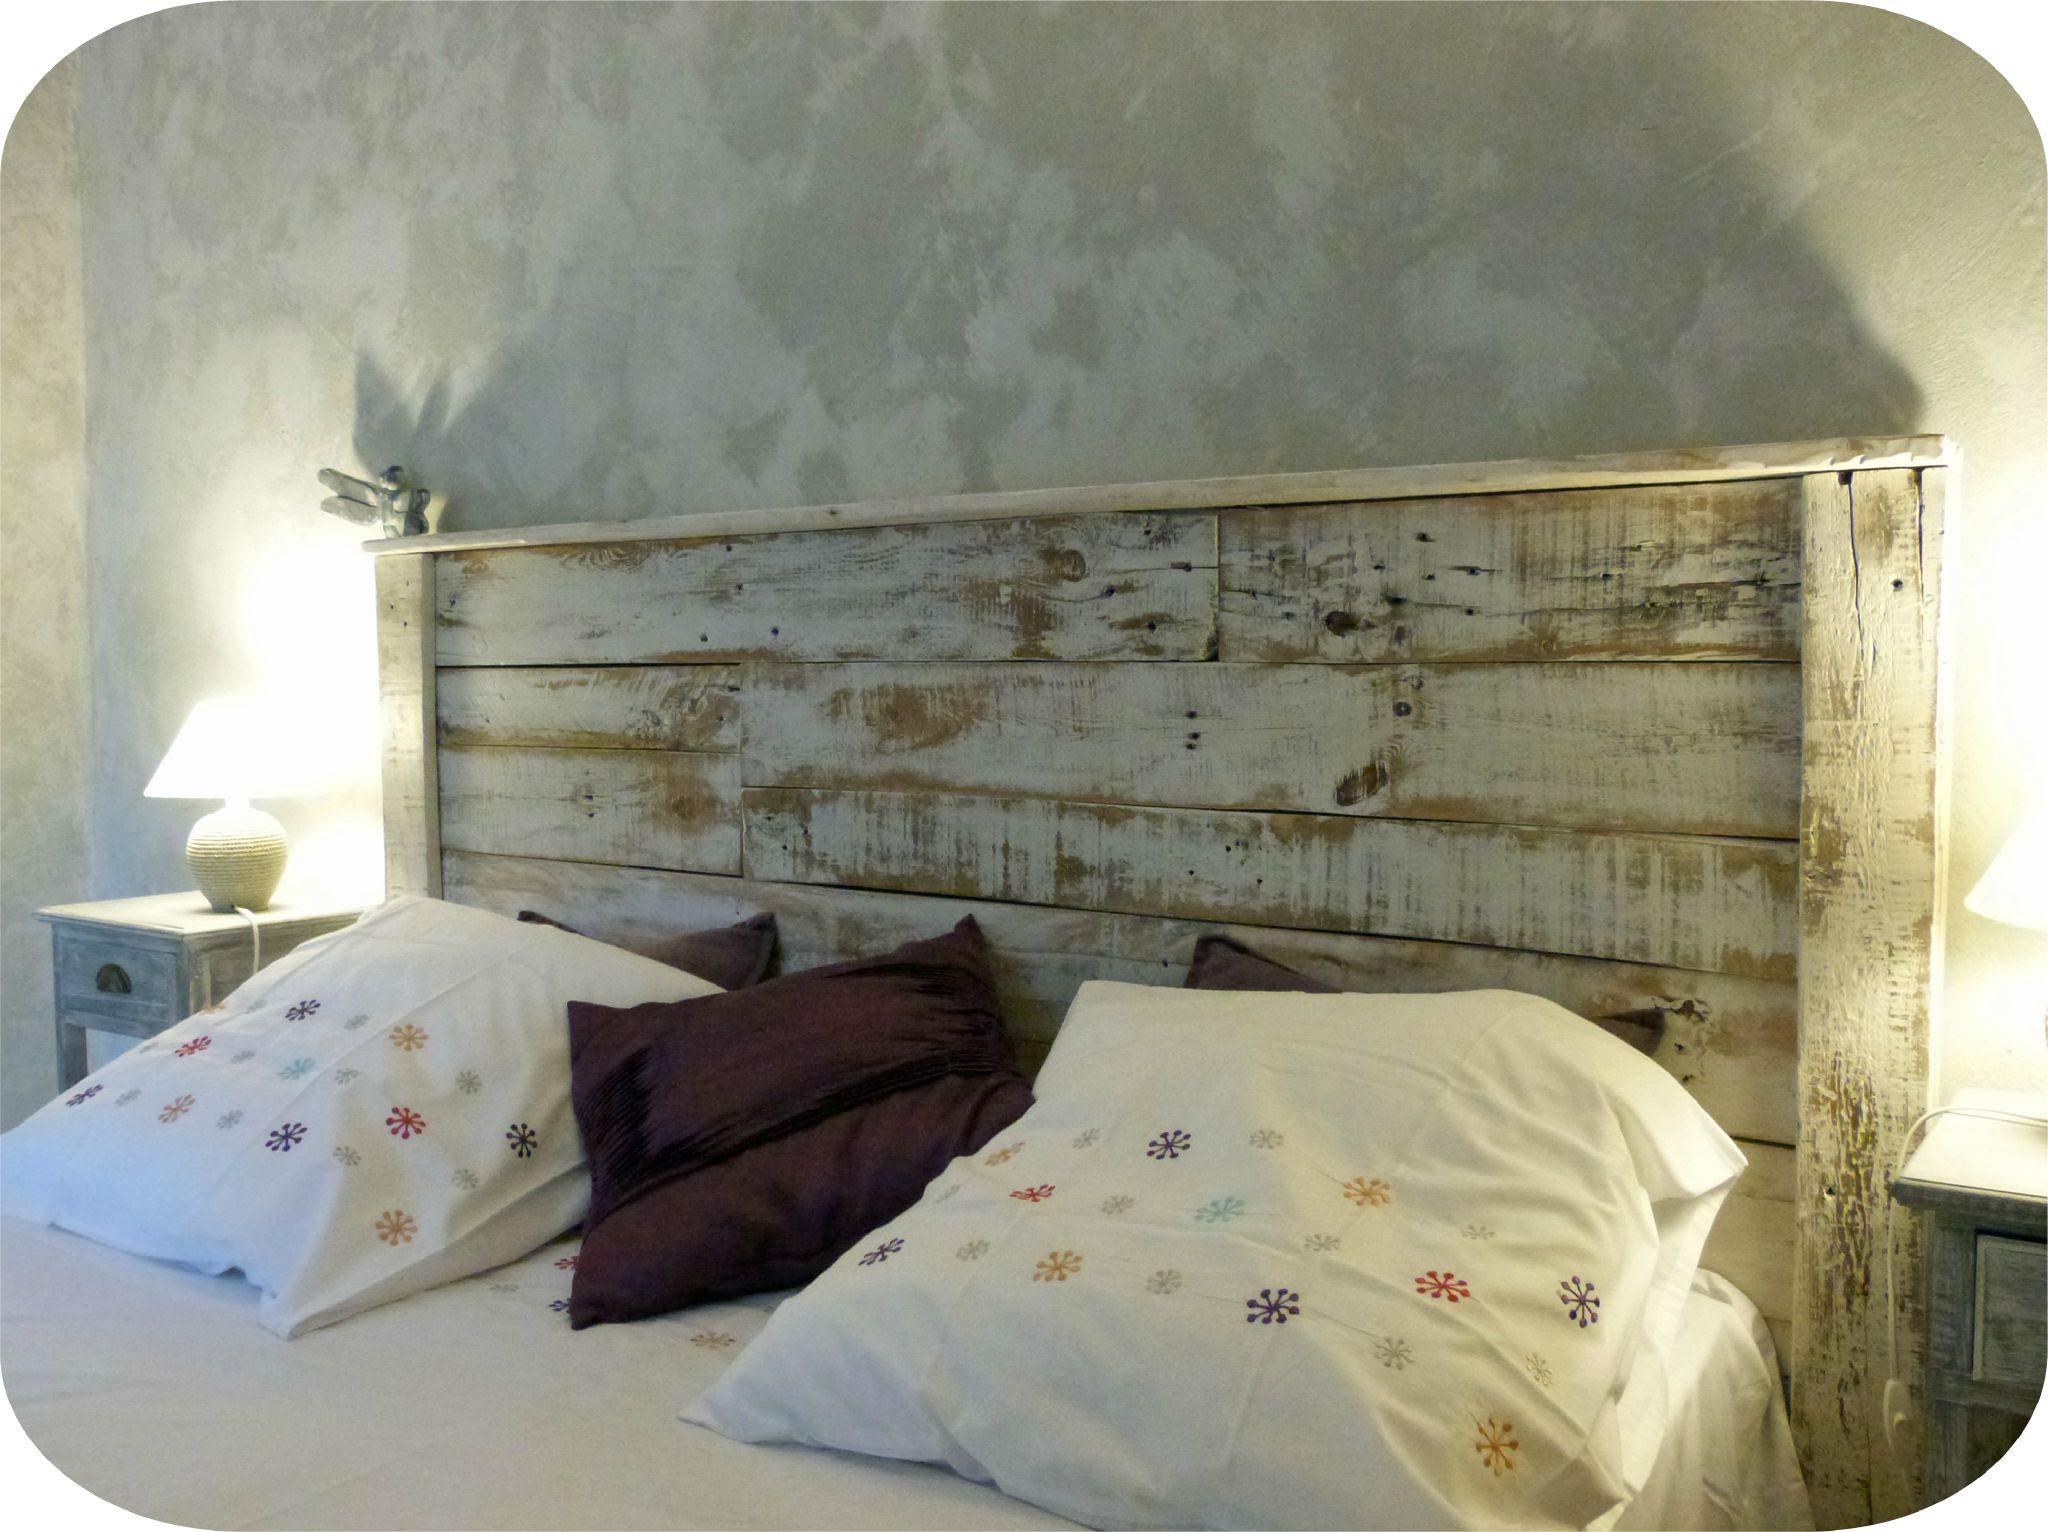 t te de lit avec palette en bois id e r cup ne jetez plus vos palettes. Black Bedroom Furniture Sets. Home Design Ideas